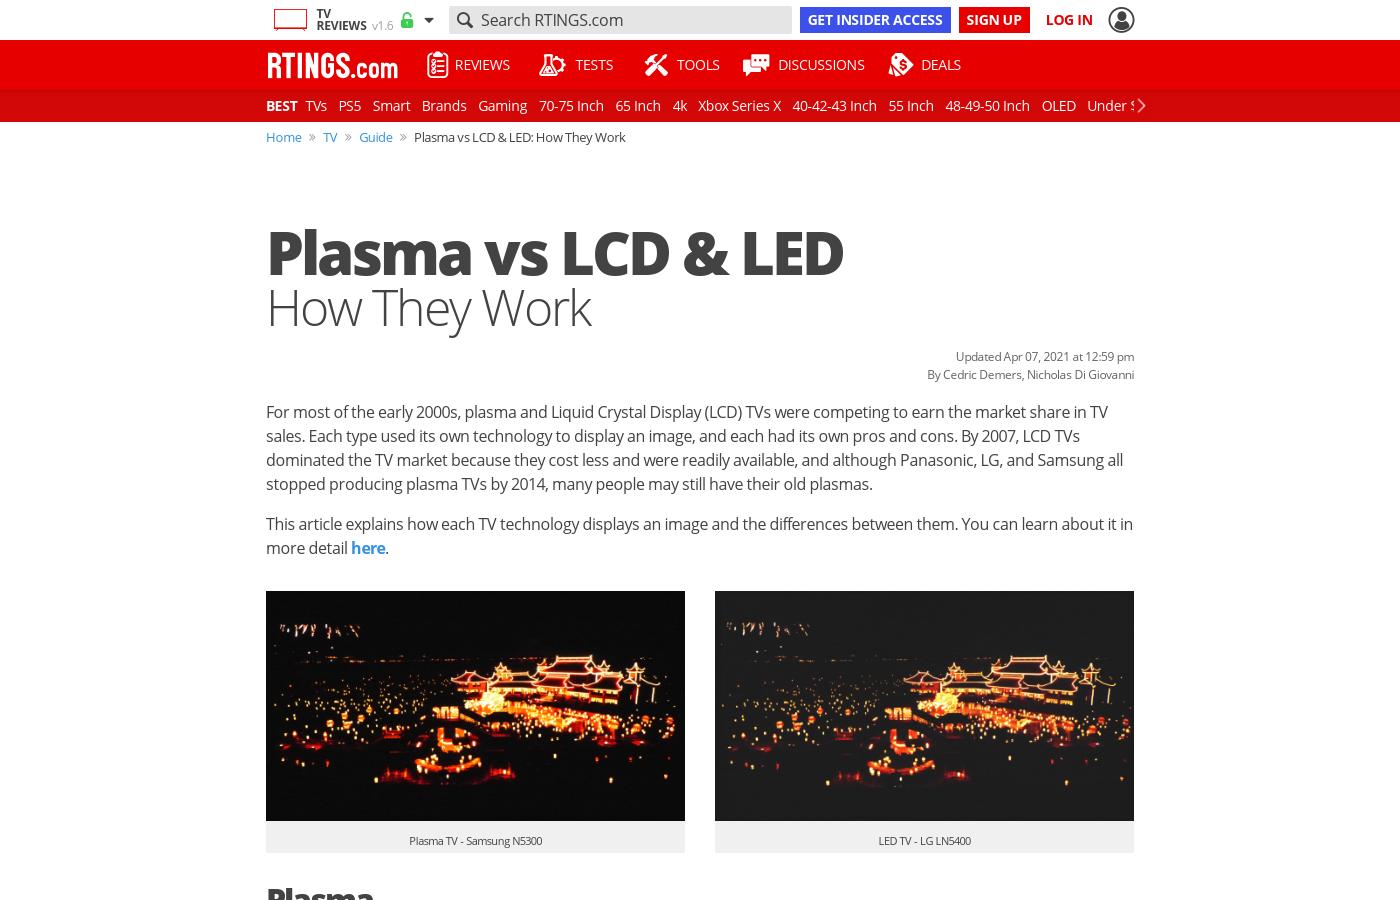 Plasma vs LED: How They Work - RTINGS com